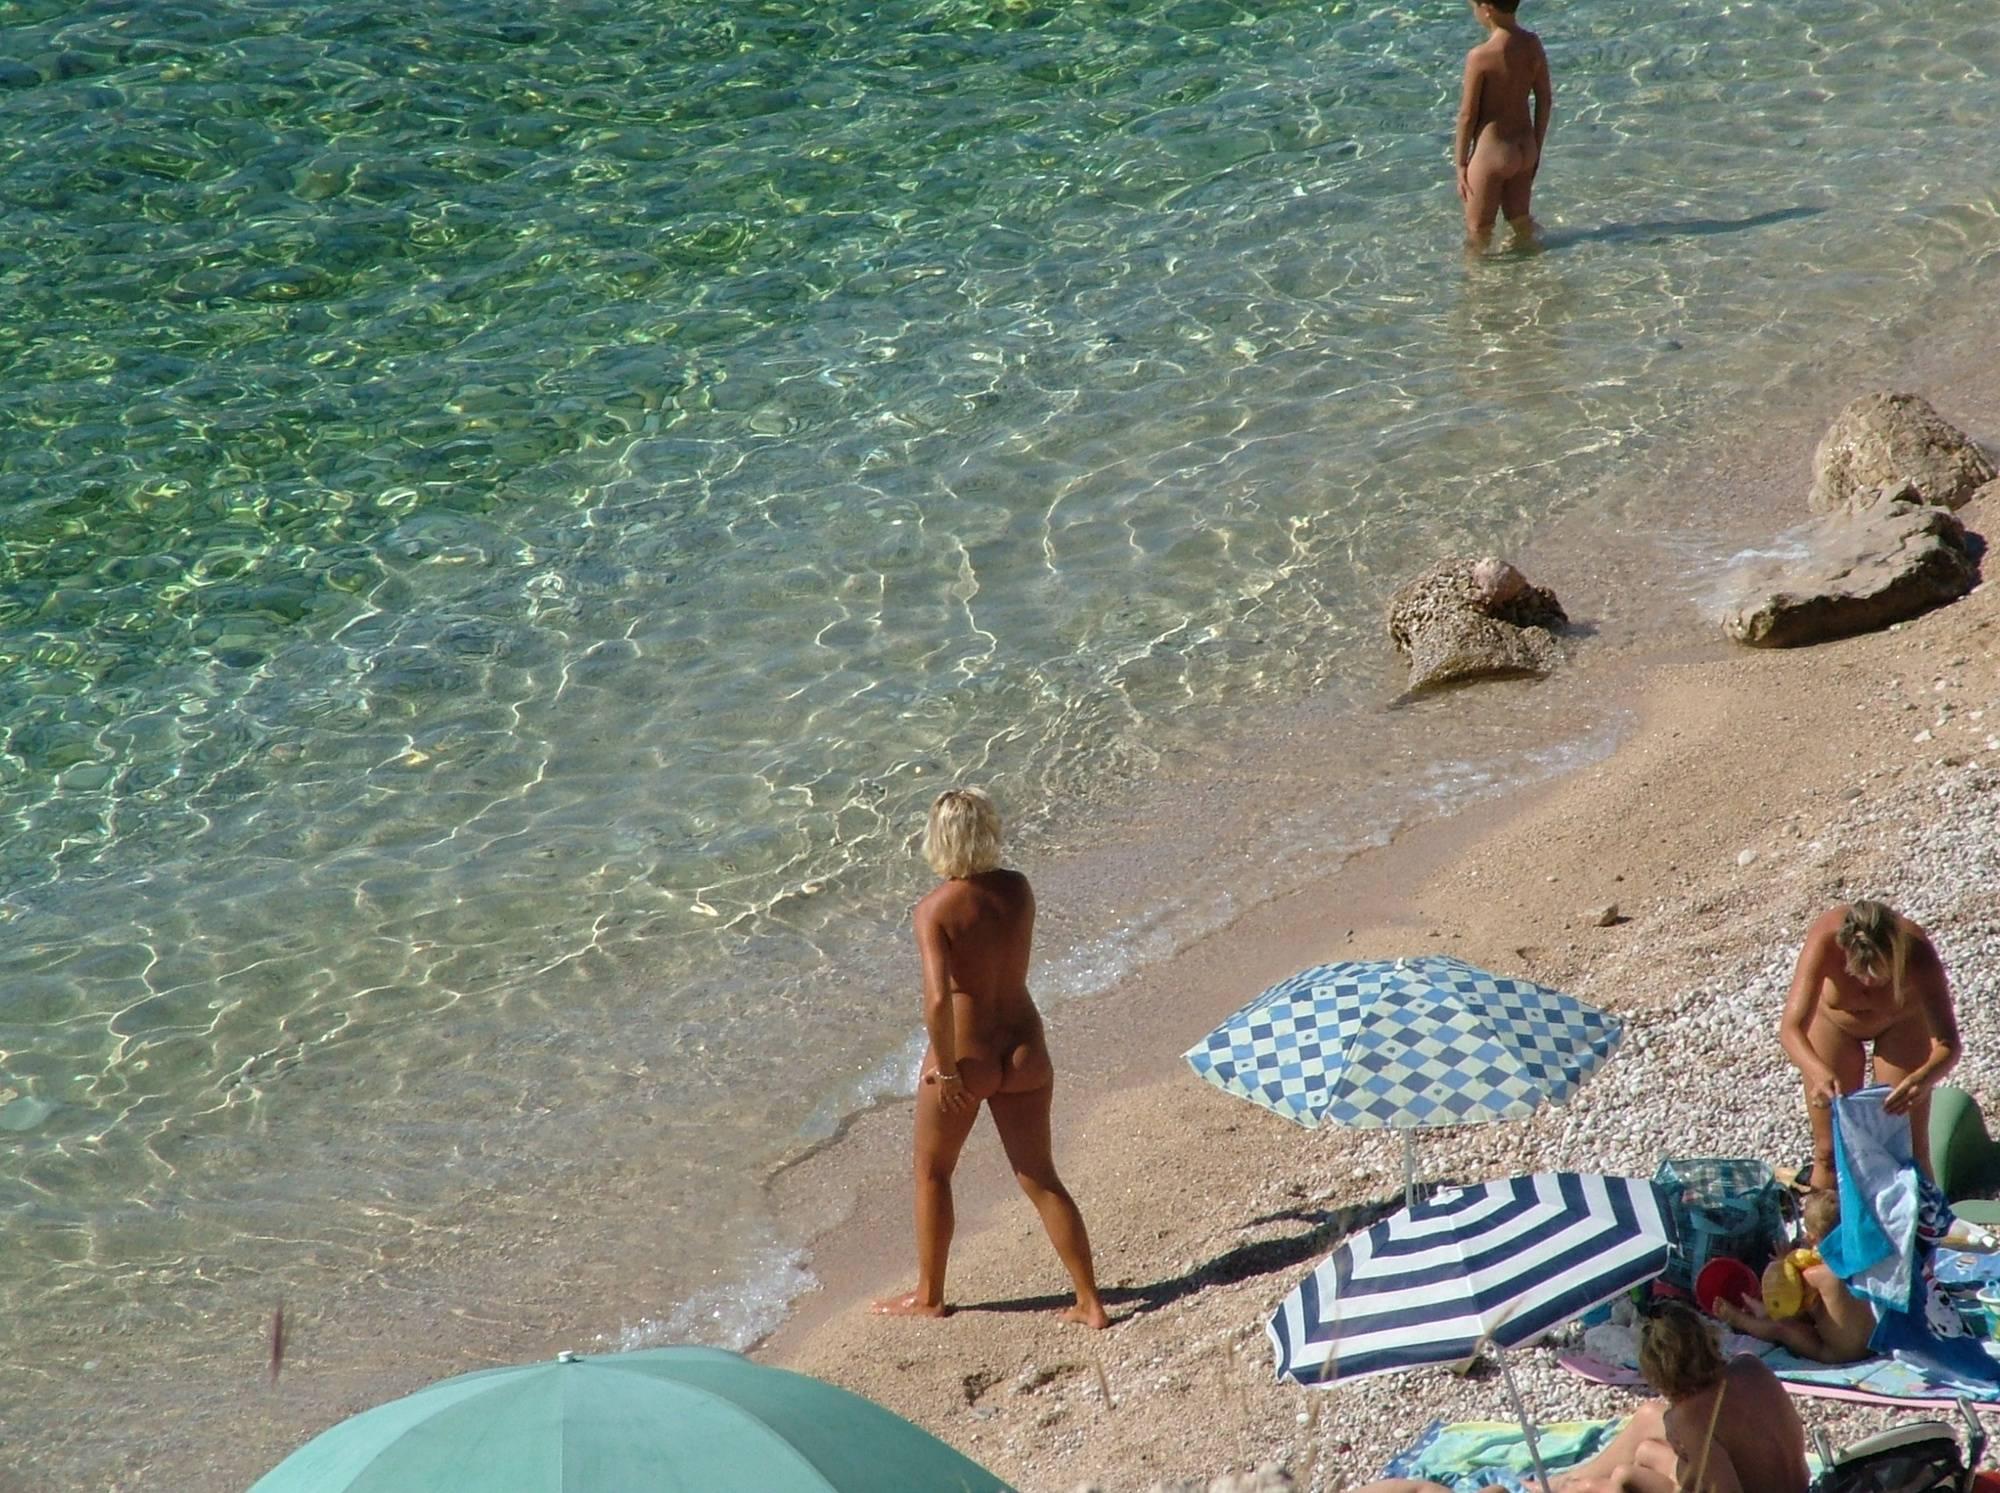 Nudist Gallery FKK Naked Oasis Shoreline - 2